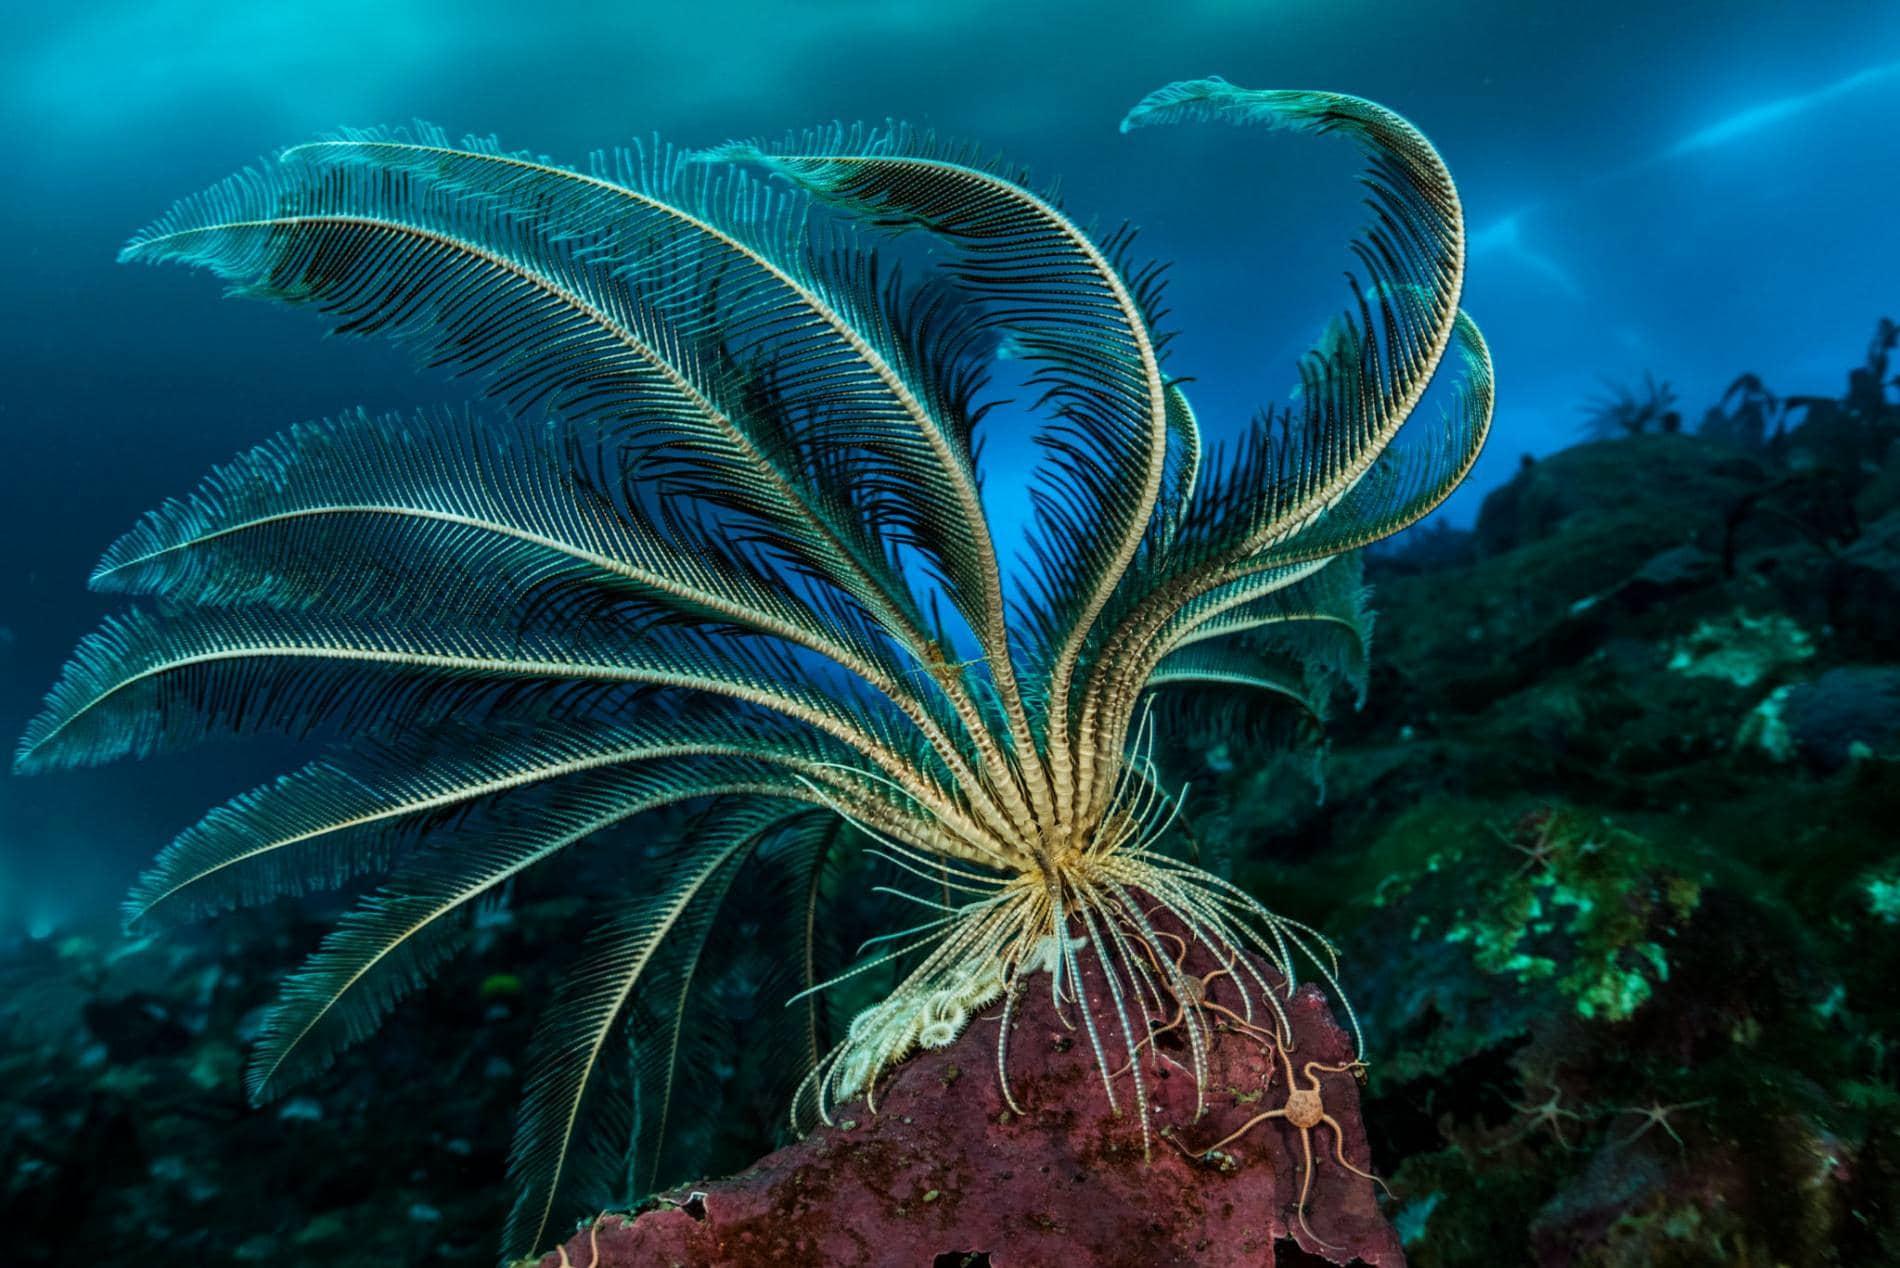 Promachocrinus kerguelensis - плавающее животное